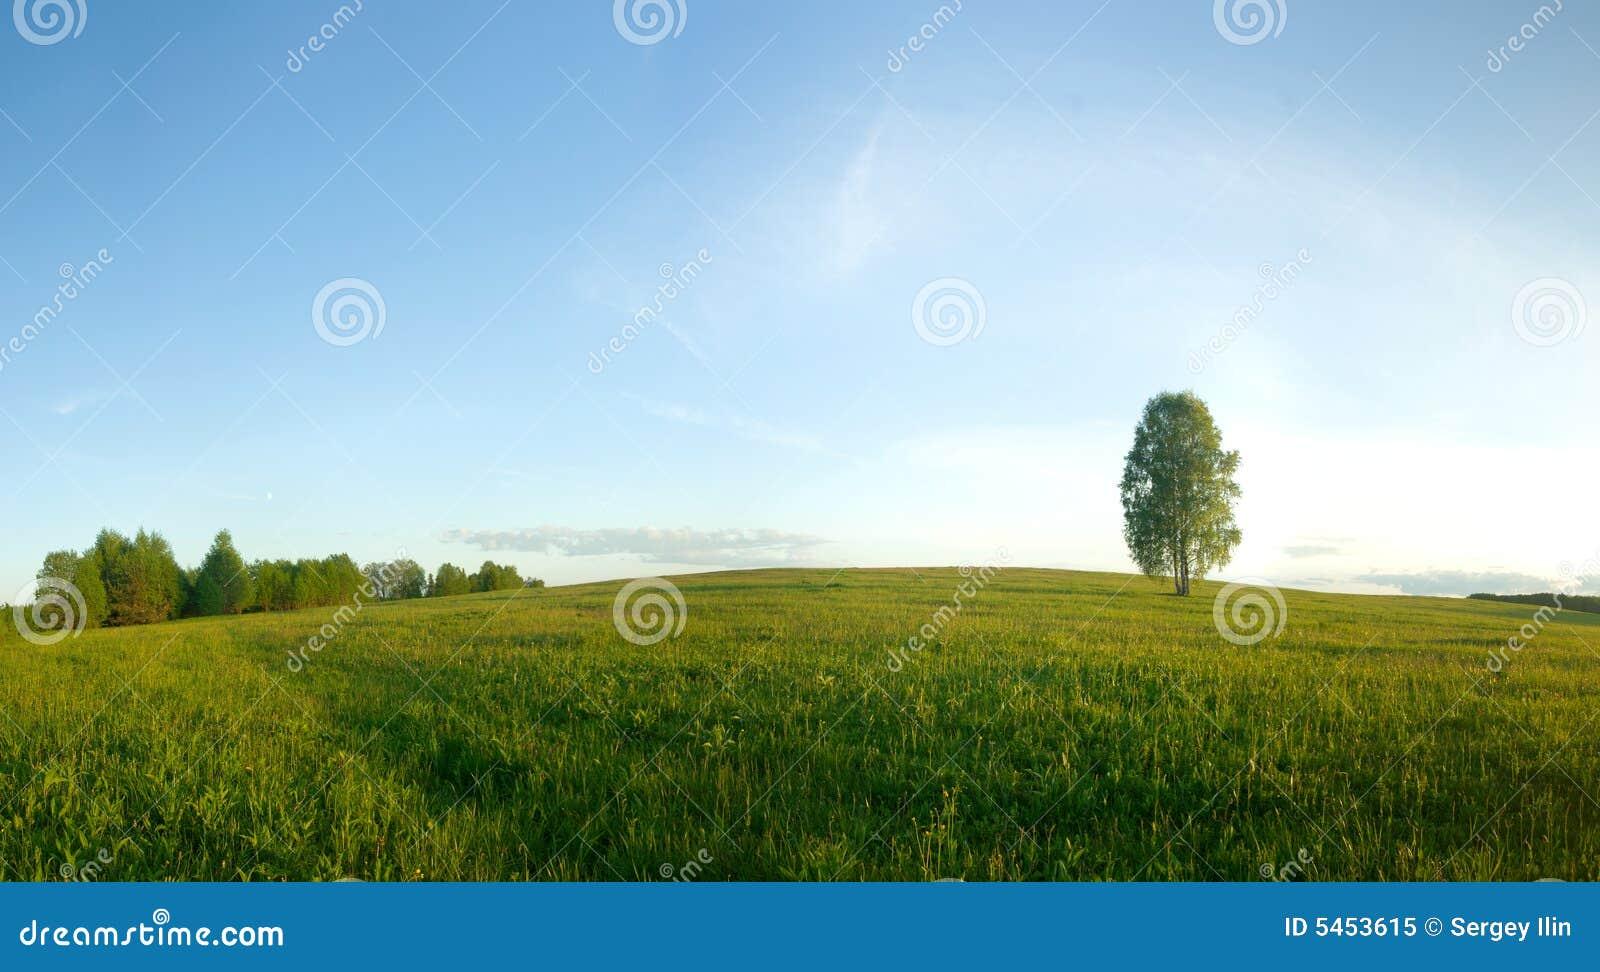 Betulla sola in un campo.